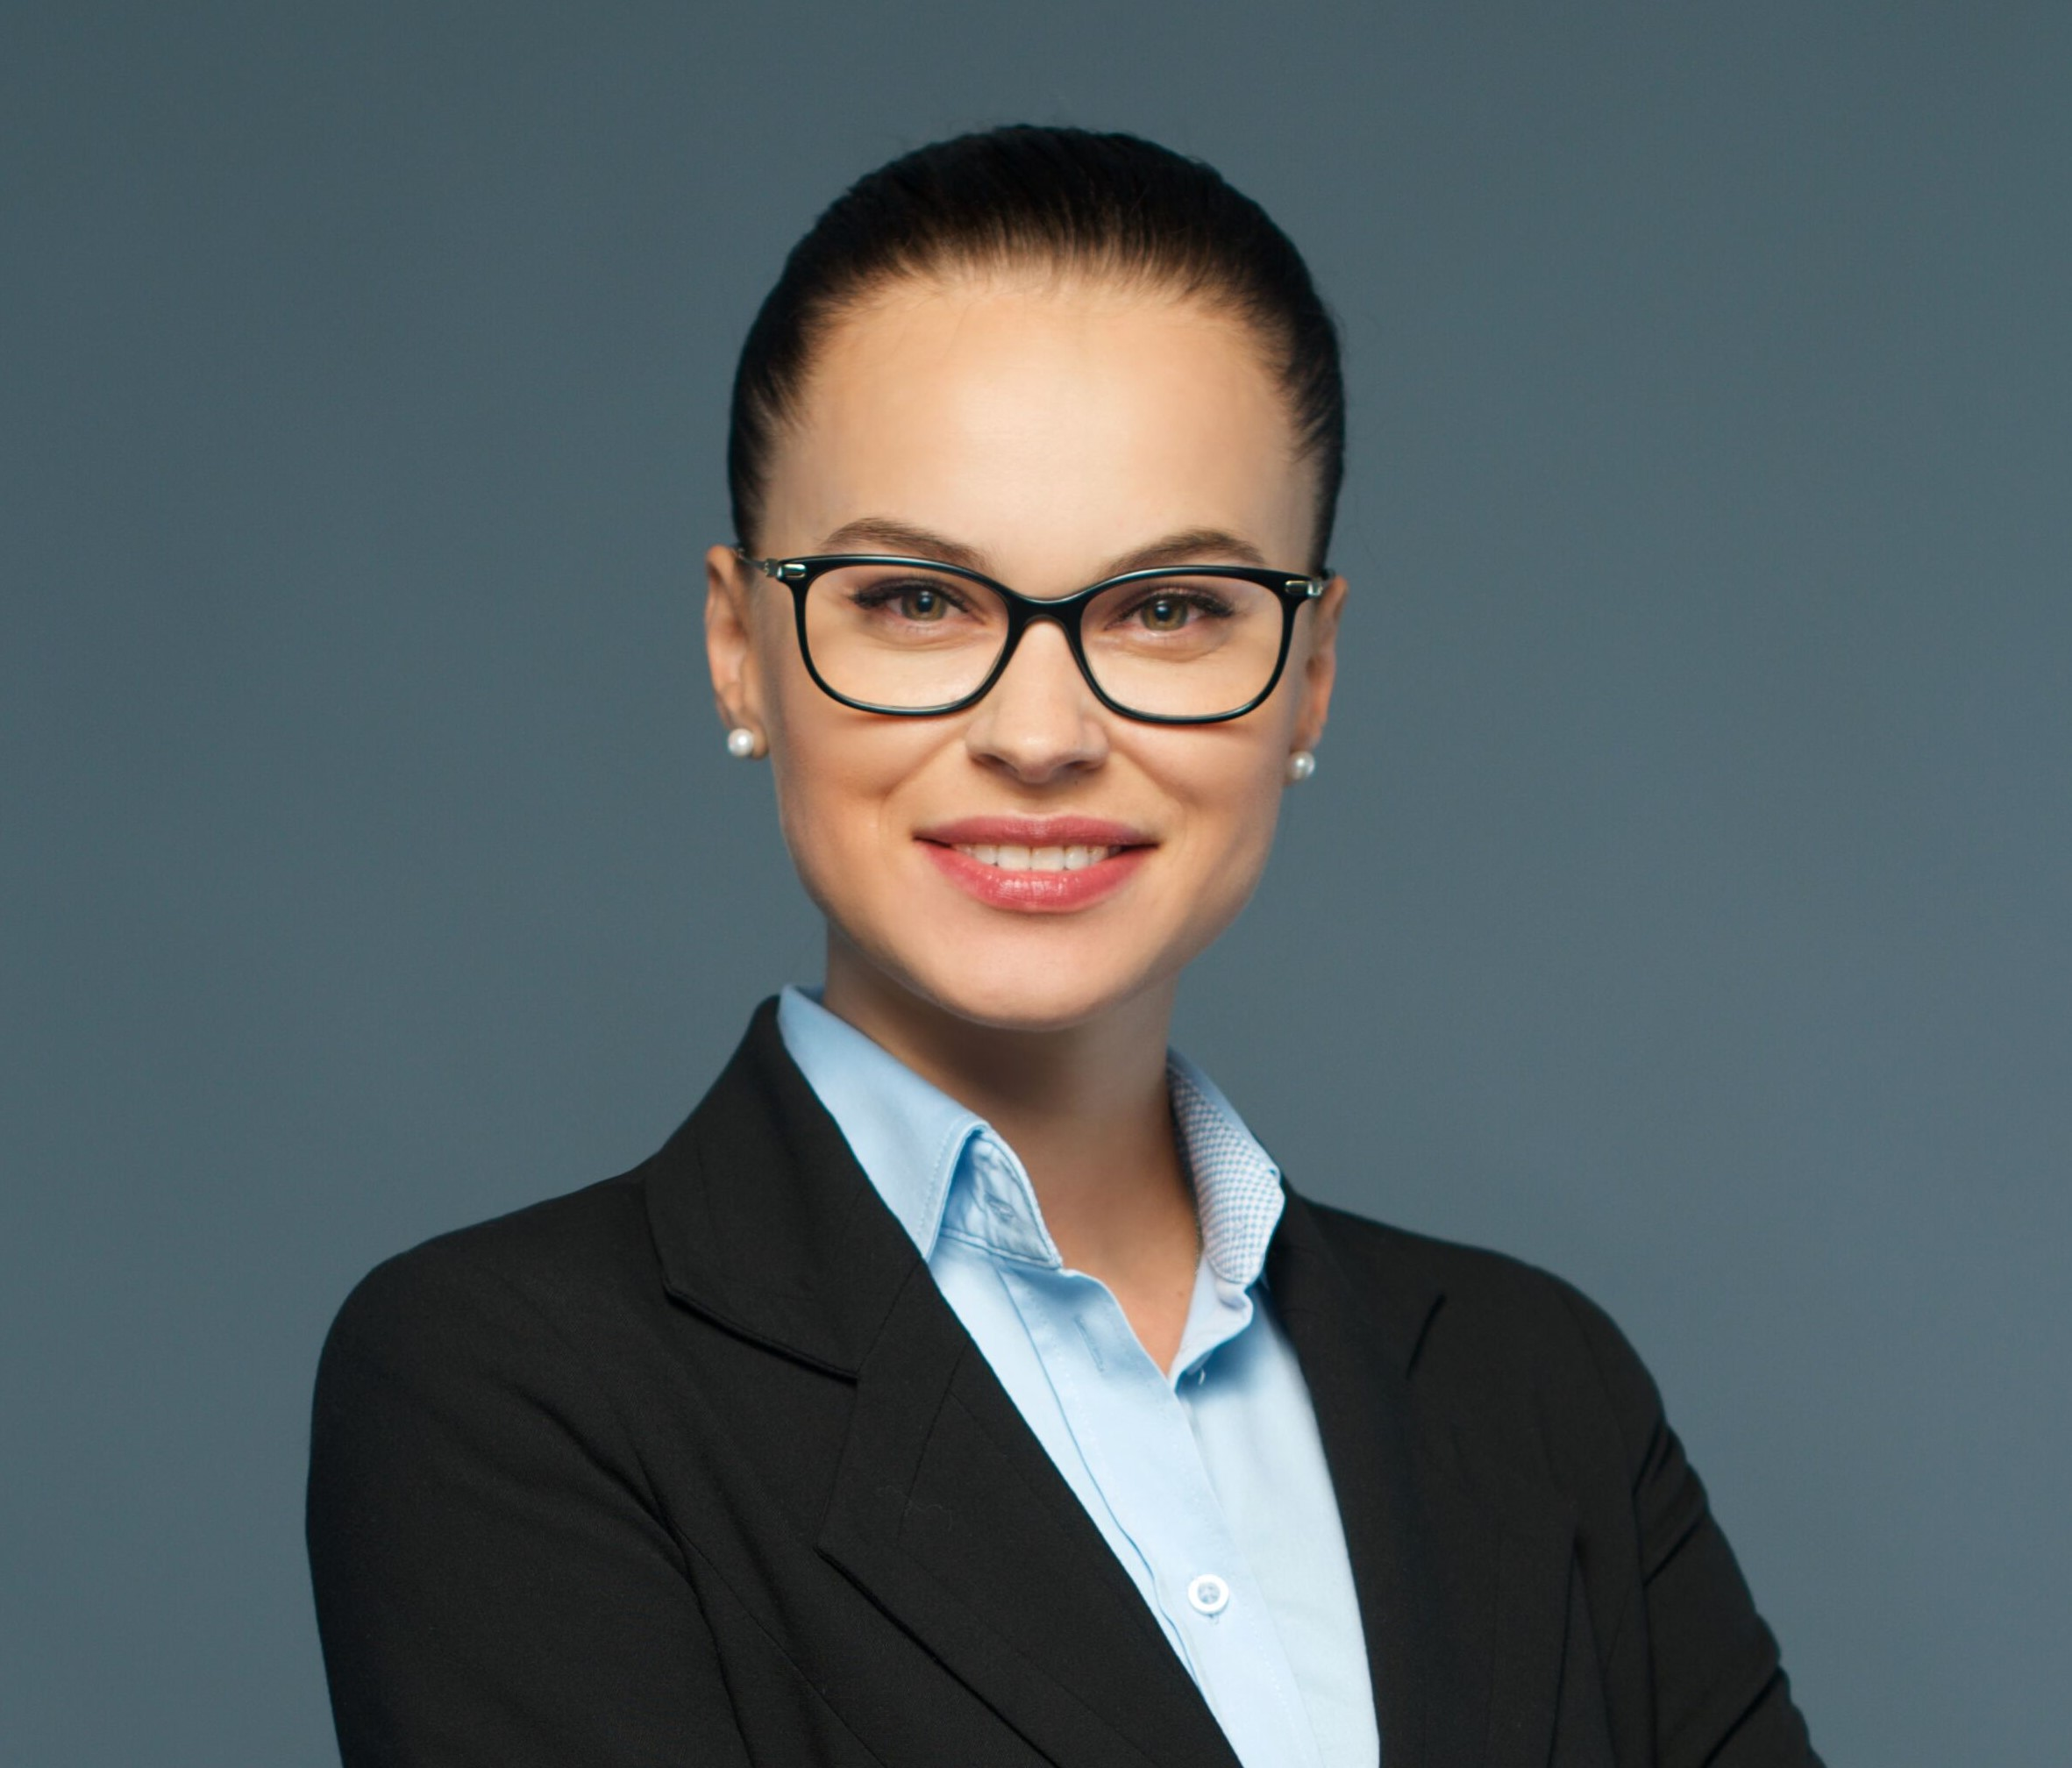 Mariola Glinka